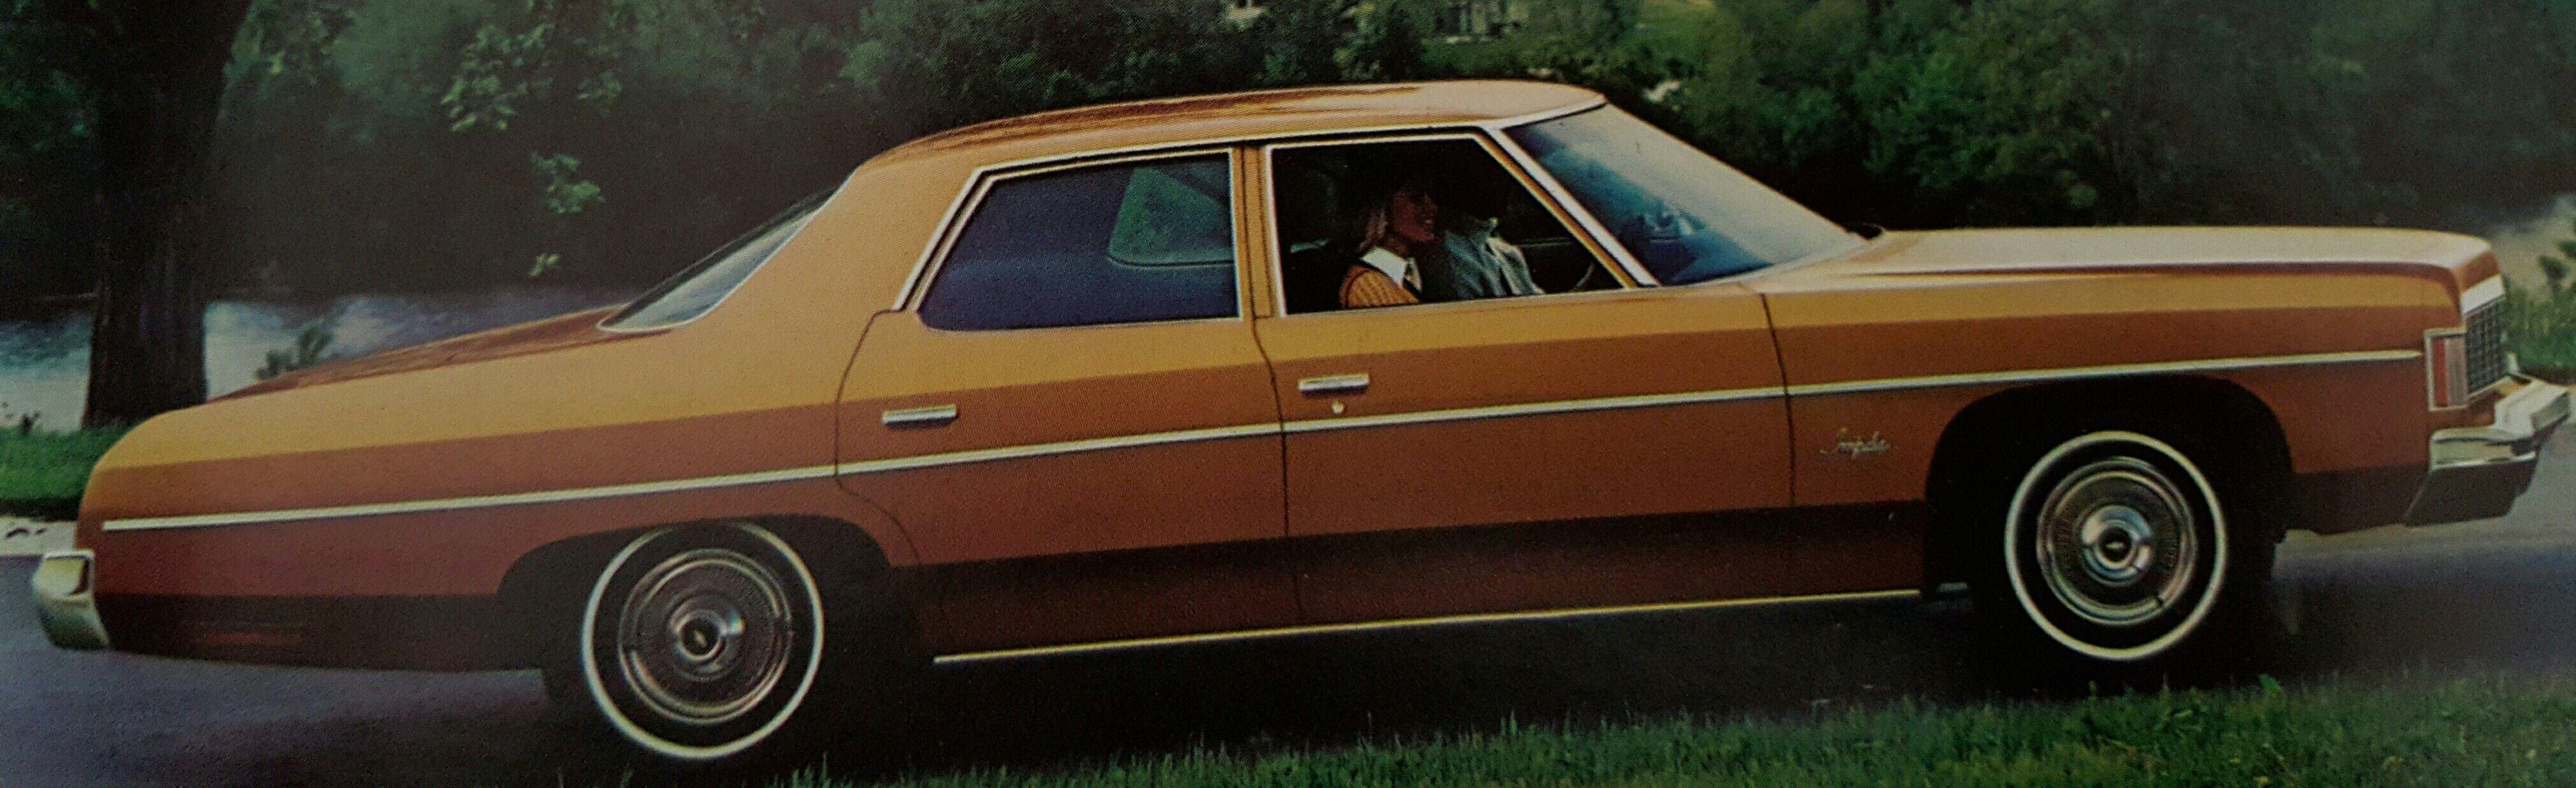 medium resolution of 1974 chevrolet impala chevrolet trucks chevrolet impala chevy chevy impala